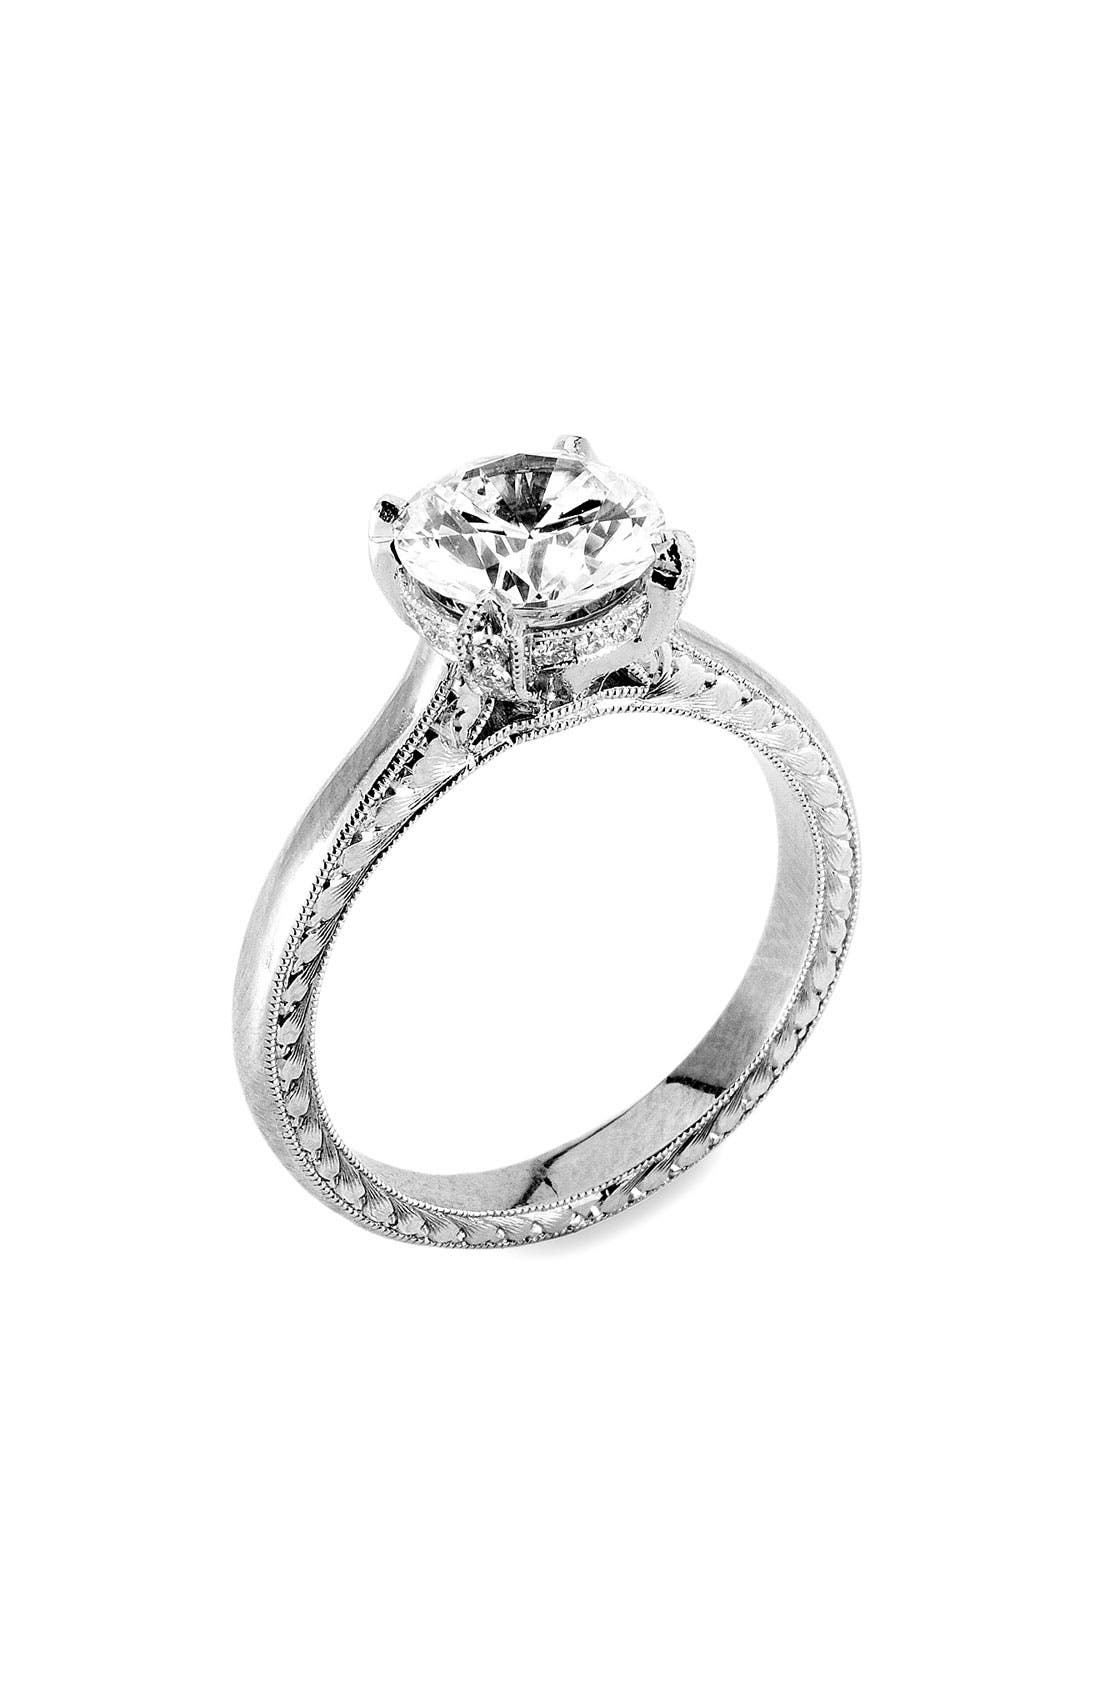 Main Image - Jack Kelége Platinum & Diamond Setting Ring